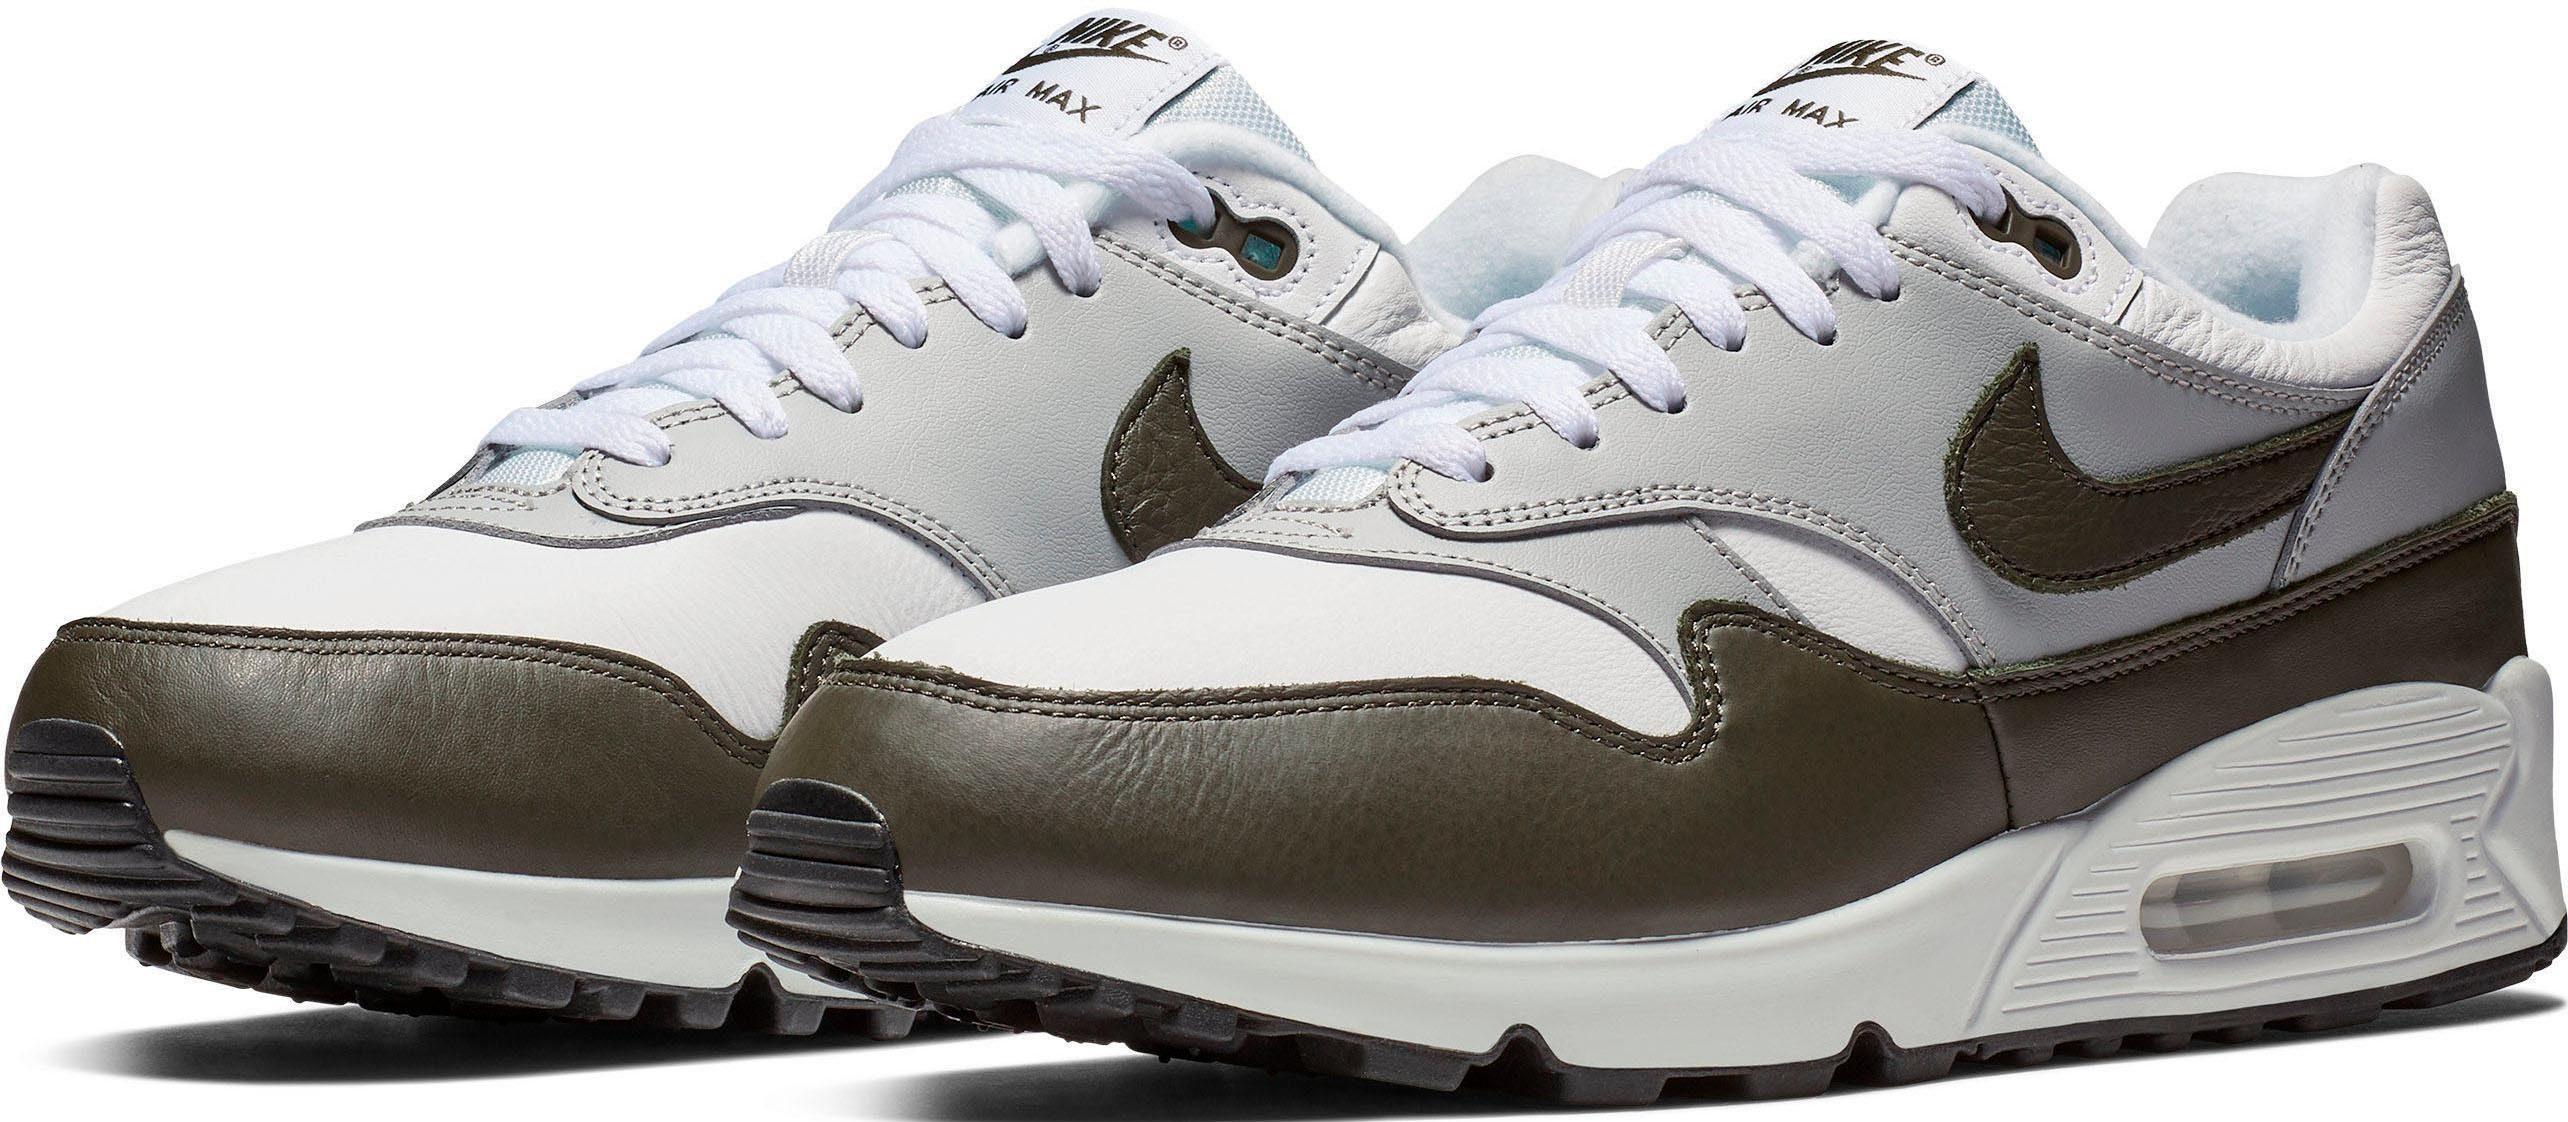 Nike Herren WEISS Sneaker AIR MAX VISION Hochwertiges Textil